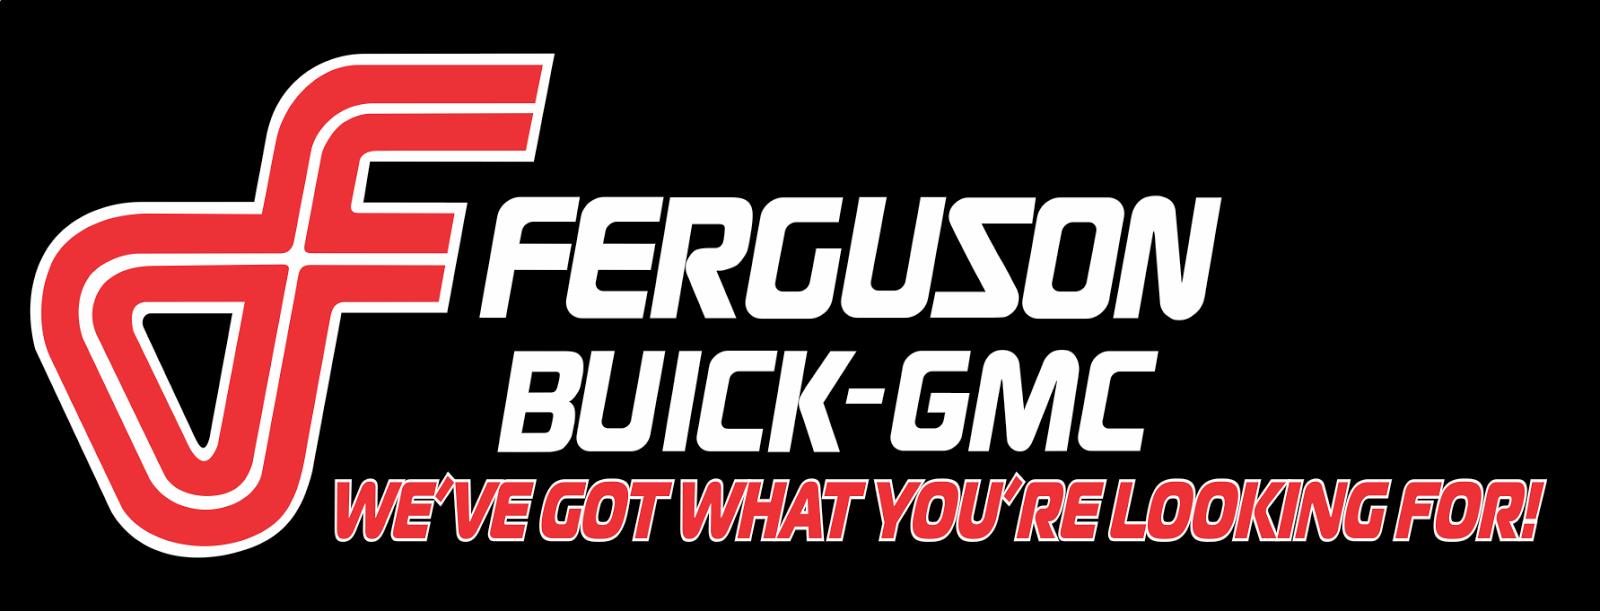 http://www.fergusonbuickgmc.com/HomePage